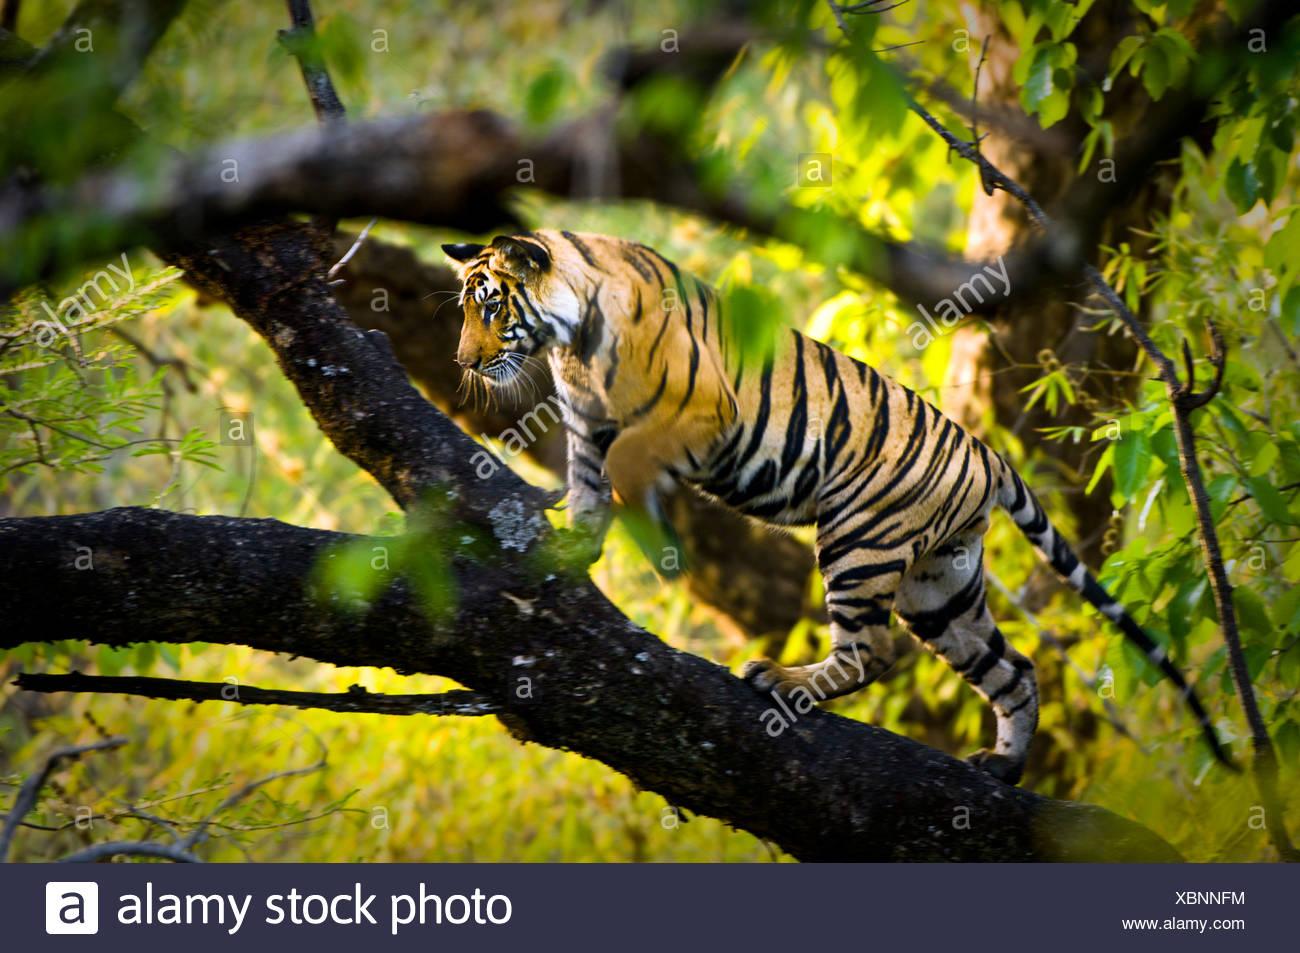 Adolescente varón Tigre de Bengala (aproximadamente 15 meses) subir a un árbol. Bandhavgarh NP, Madhya Pradesh, India. Imagen De Stock